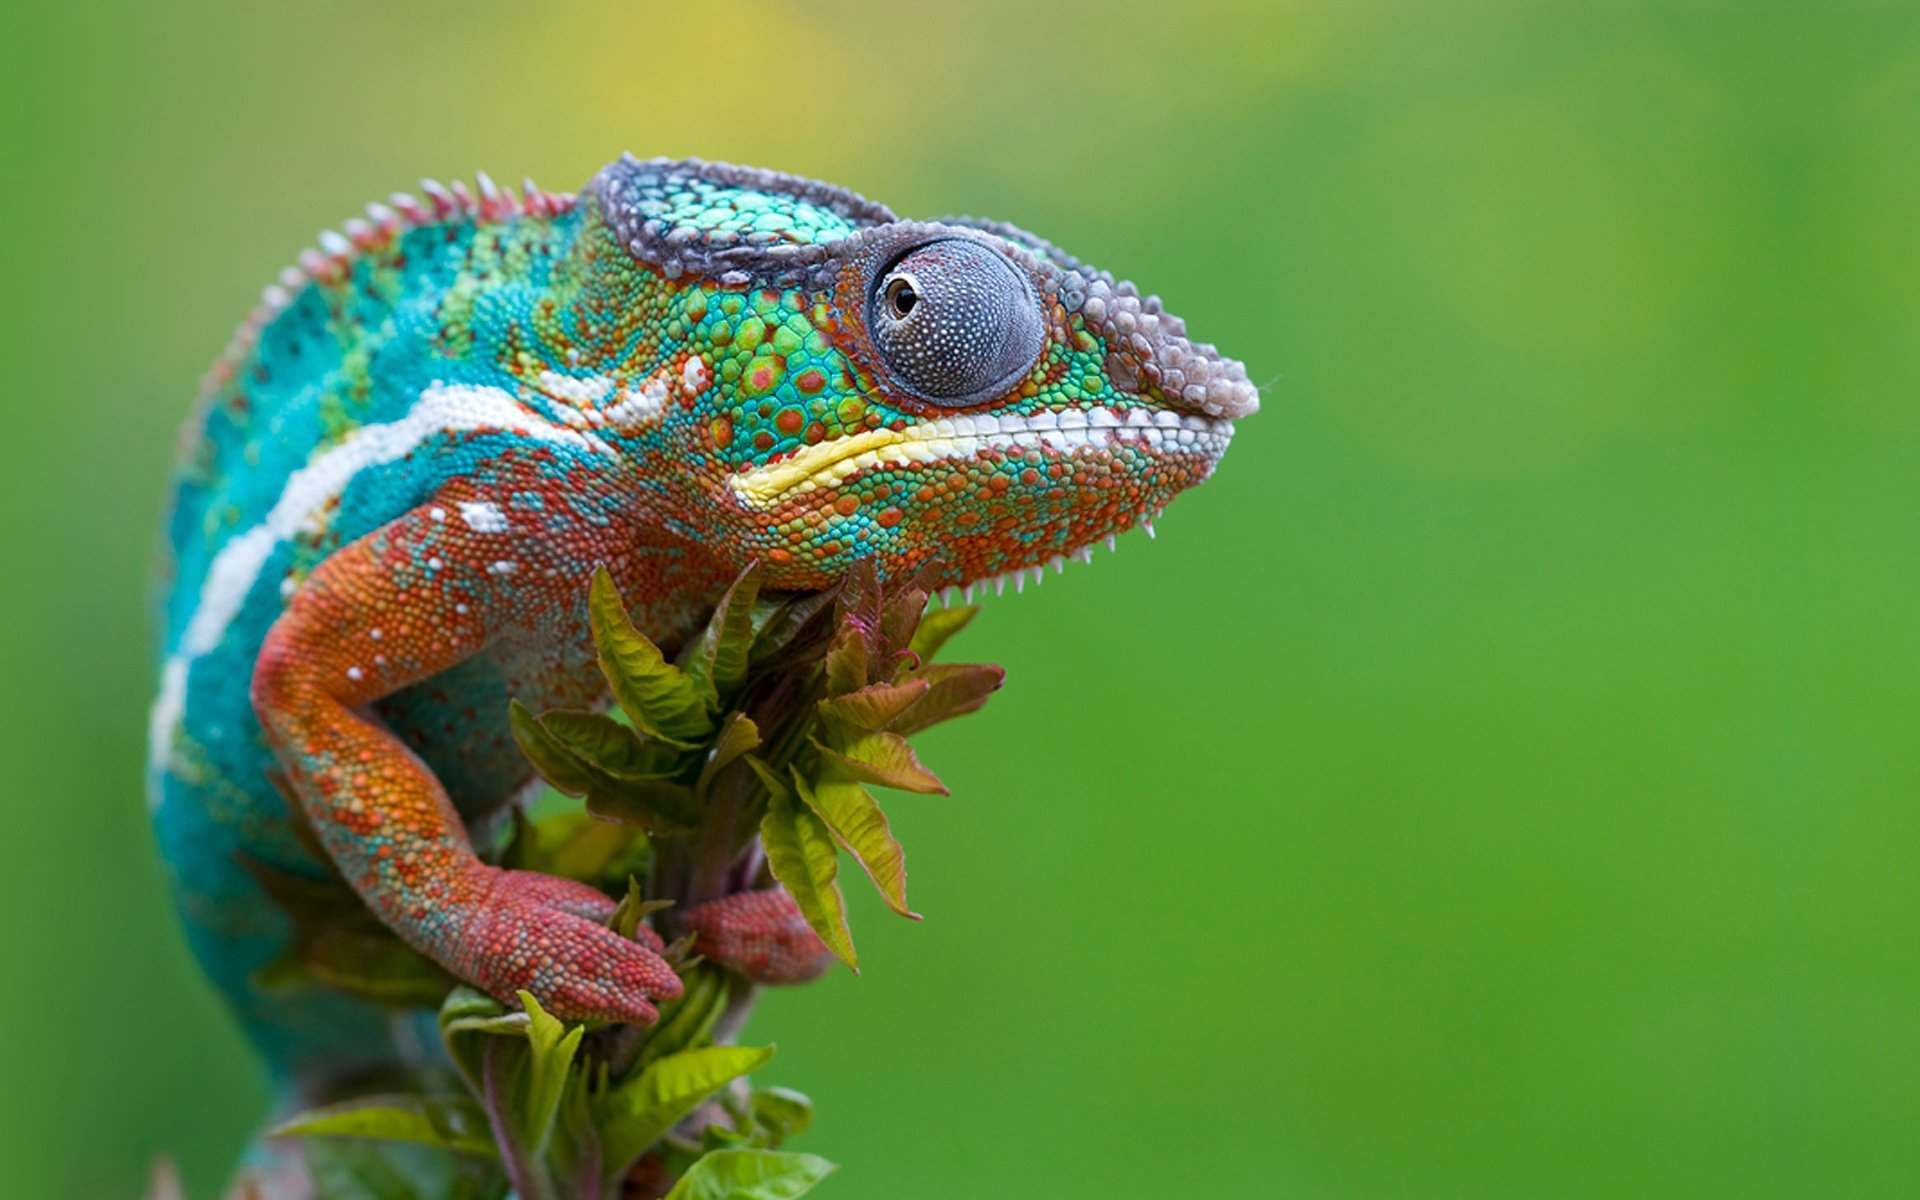 2 Lizards - Lessons - Tes Teach